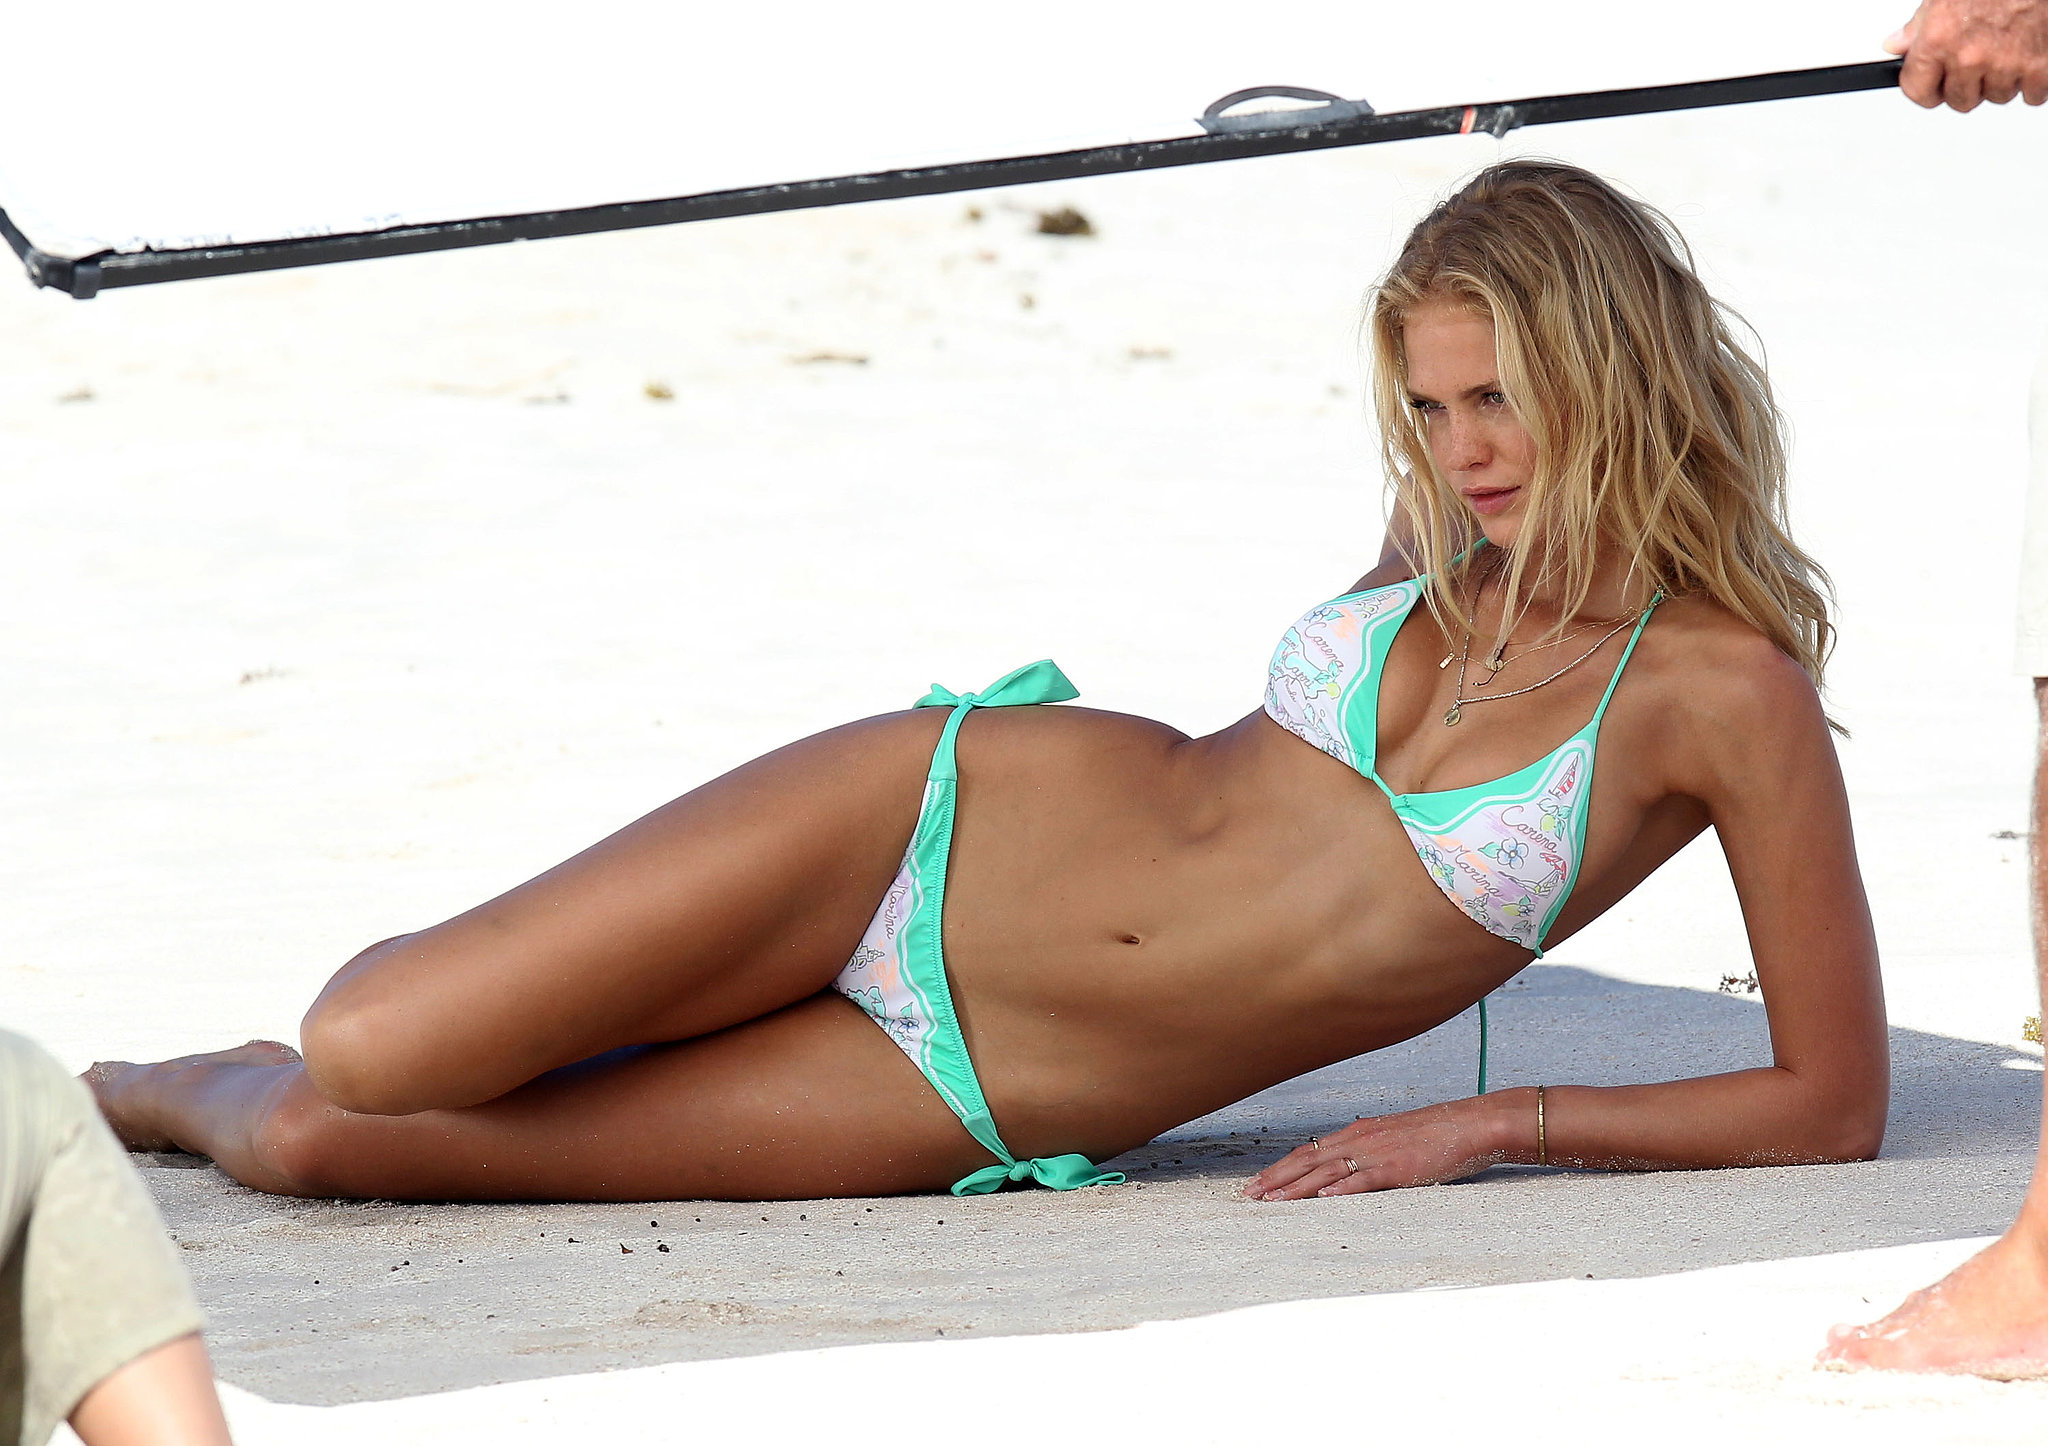 February-Erin-Heatherton-modeled-bikini-during-Victoria